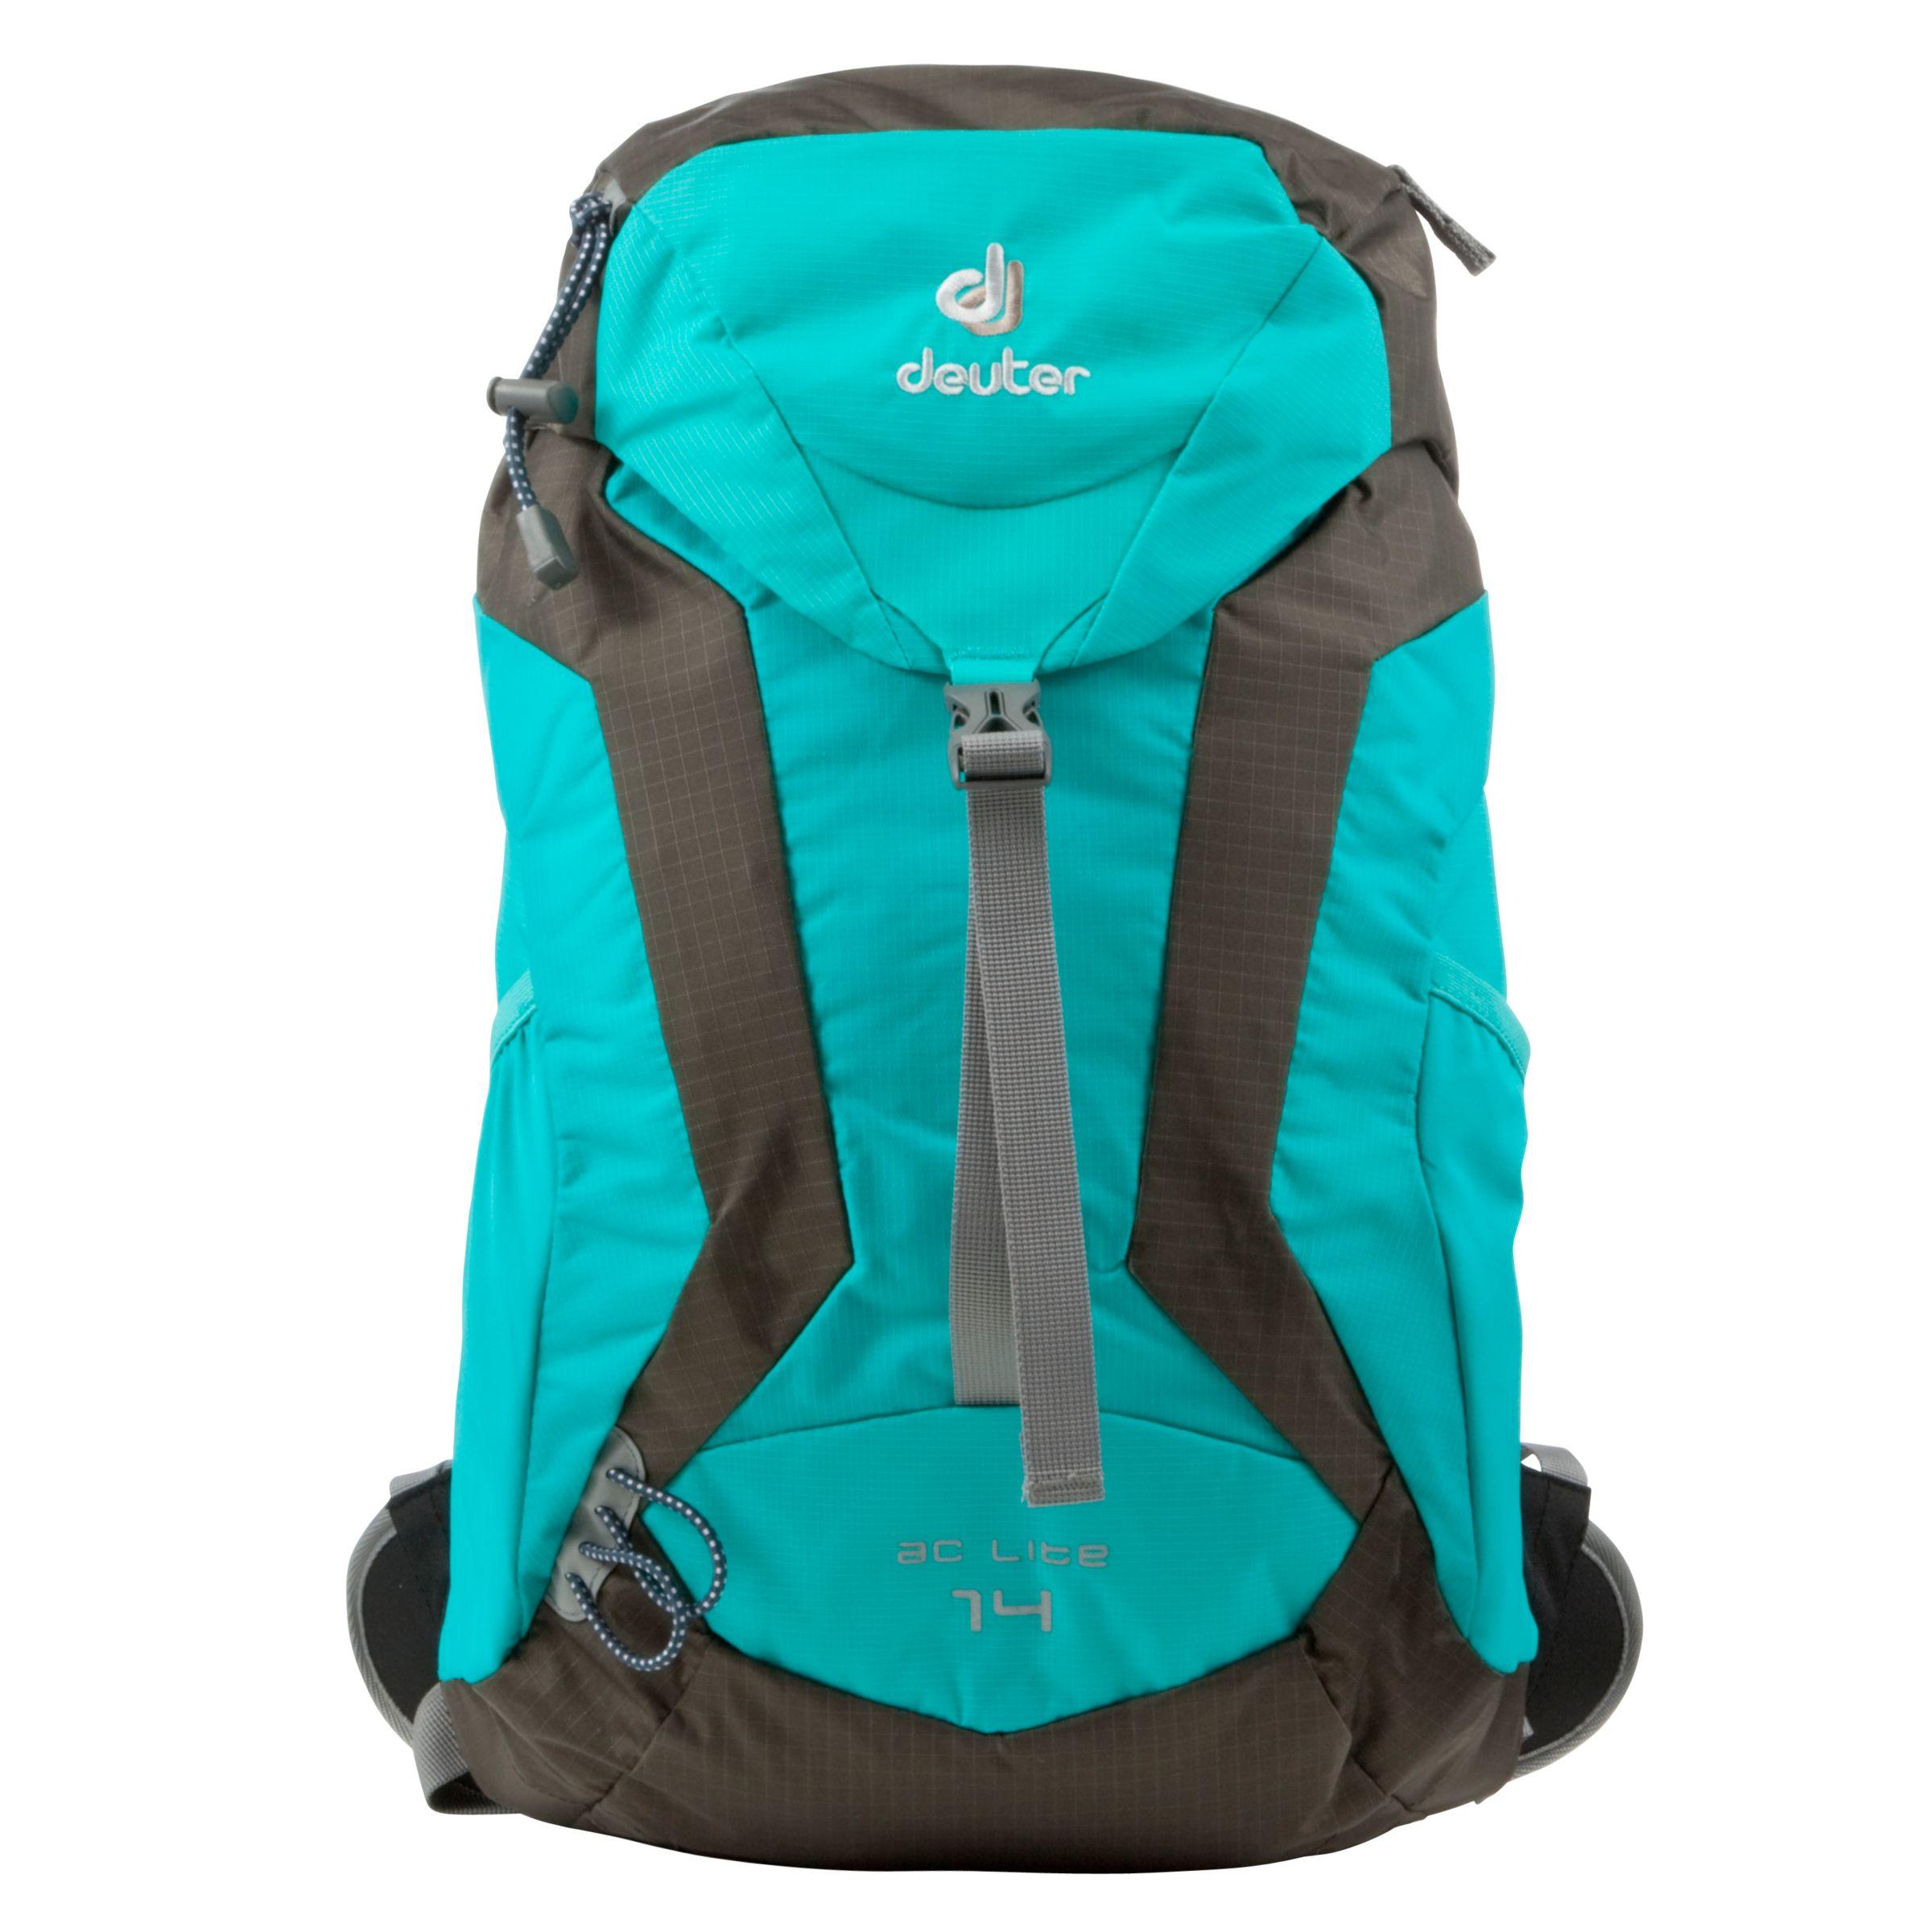 Deuter Deuter AC Lite 14 Backpack, Mint